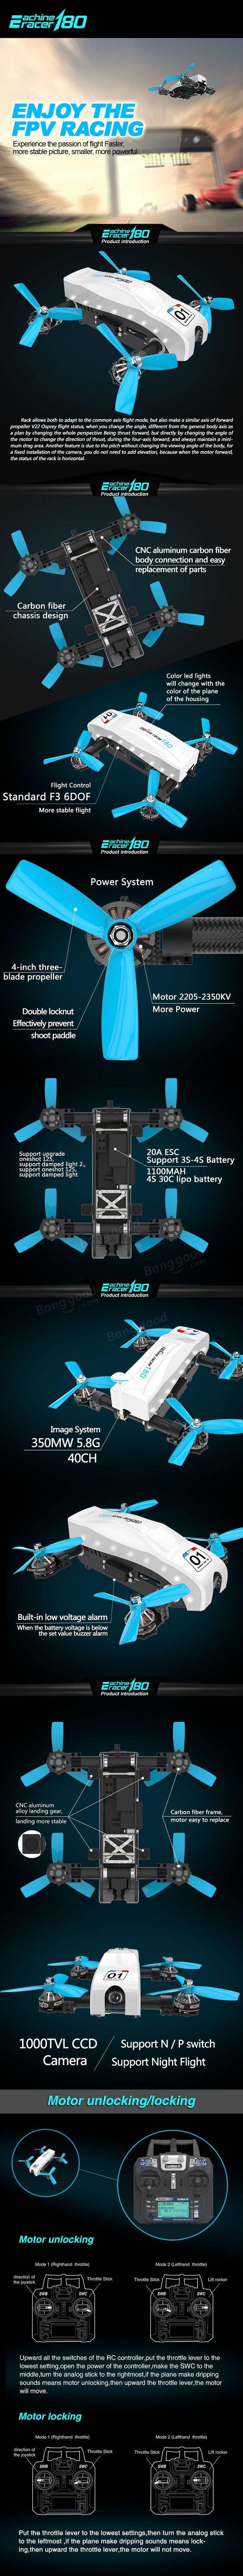 Eachine Racer 180 Tilt Rotor FPV Drone F3 350mW 5.8G 40CH VTX w/ I6 RTF(20% off coupon code:RA180)